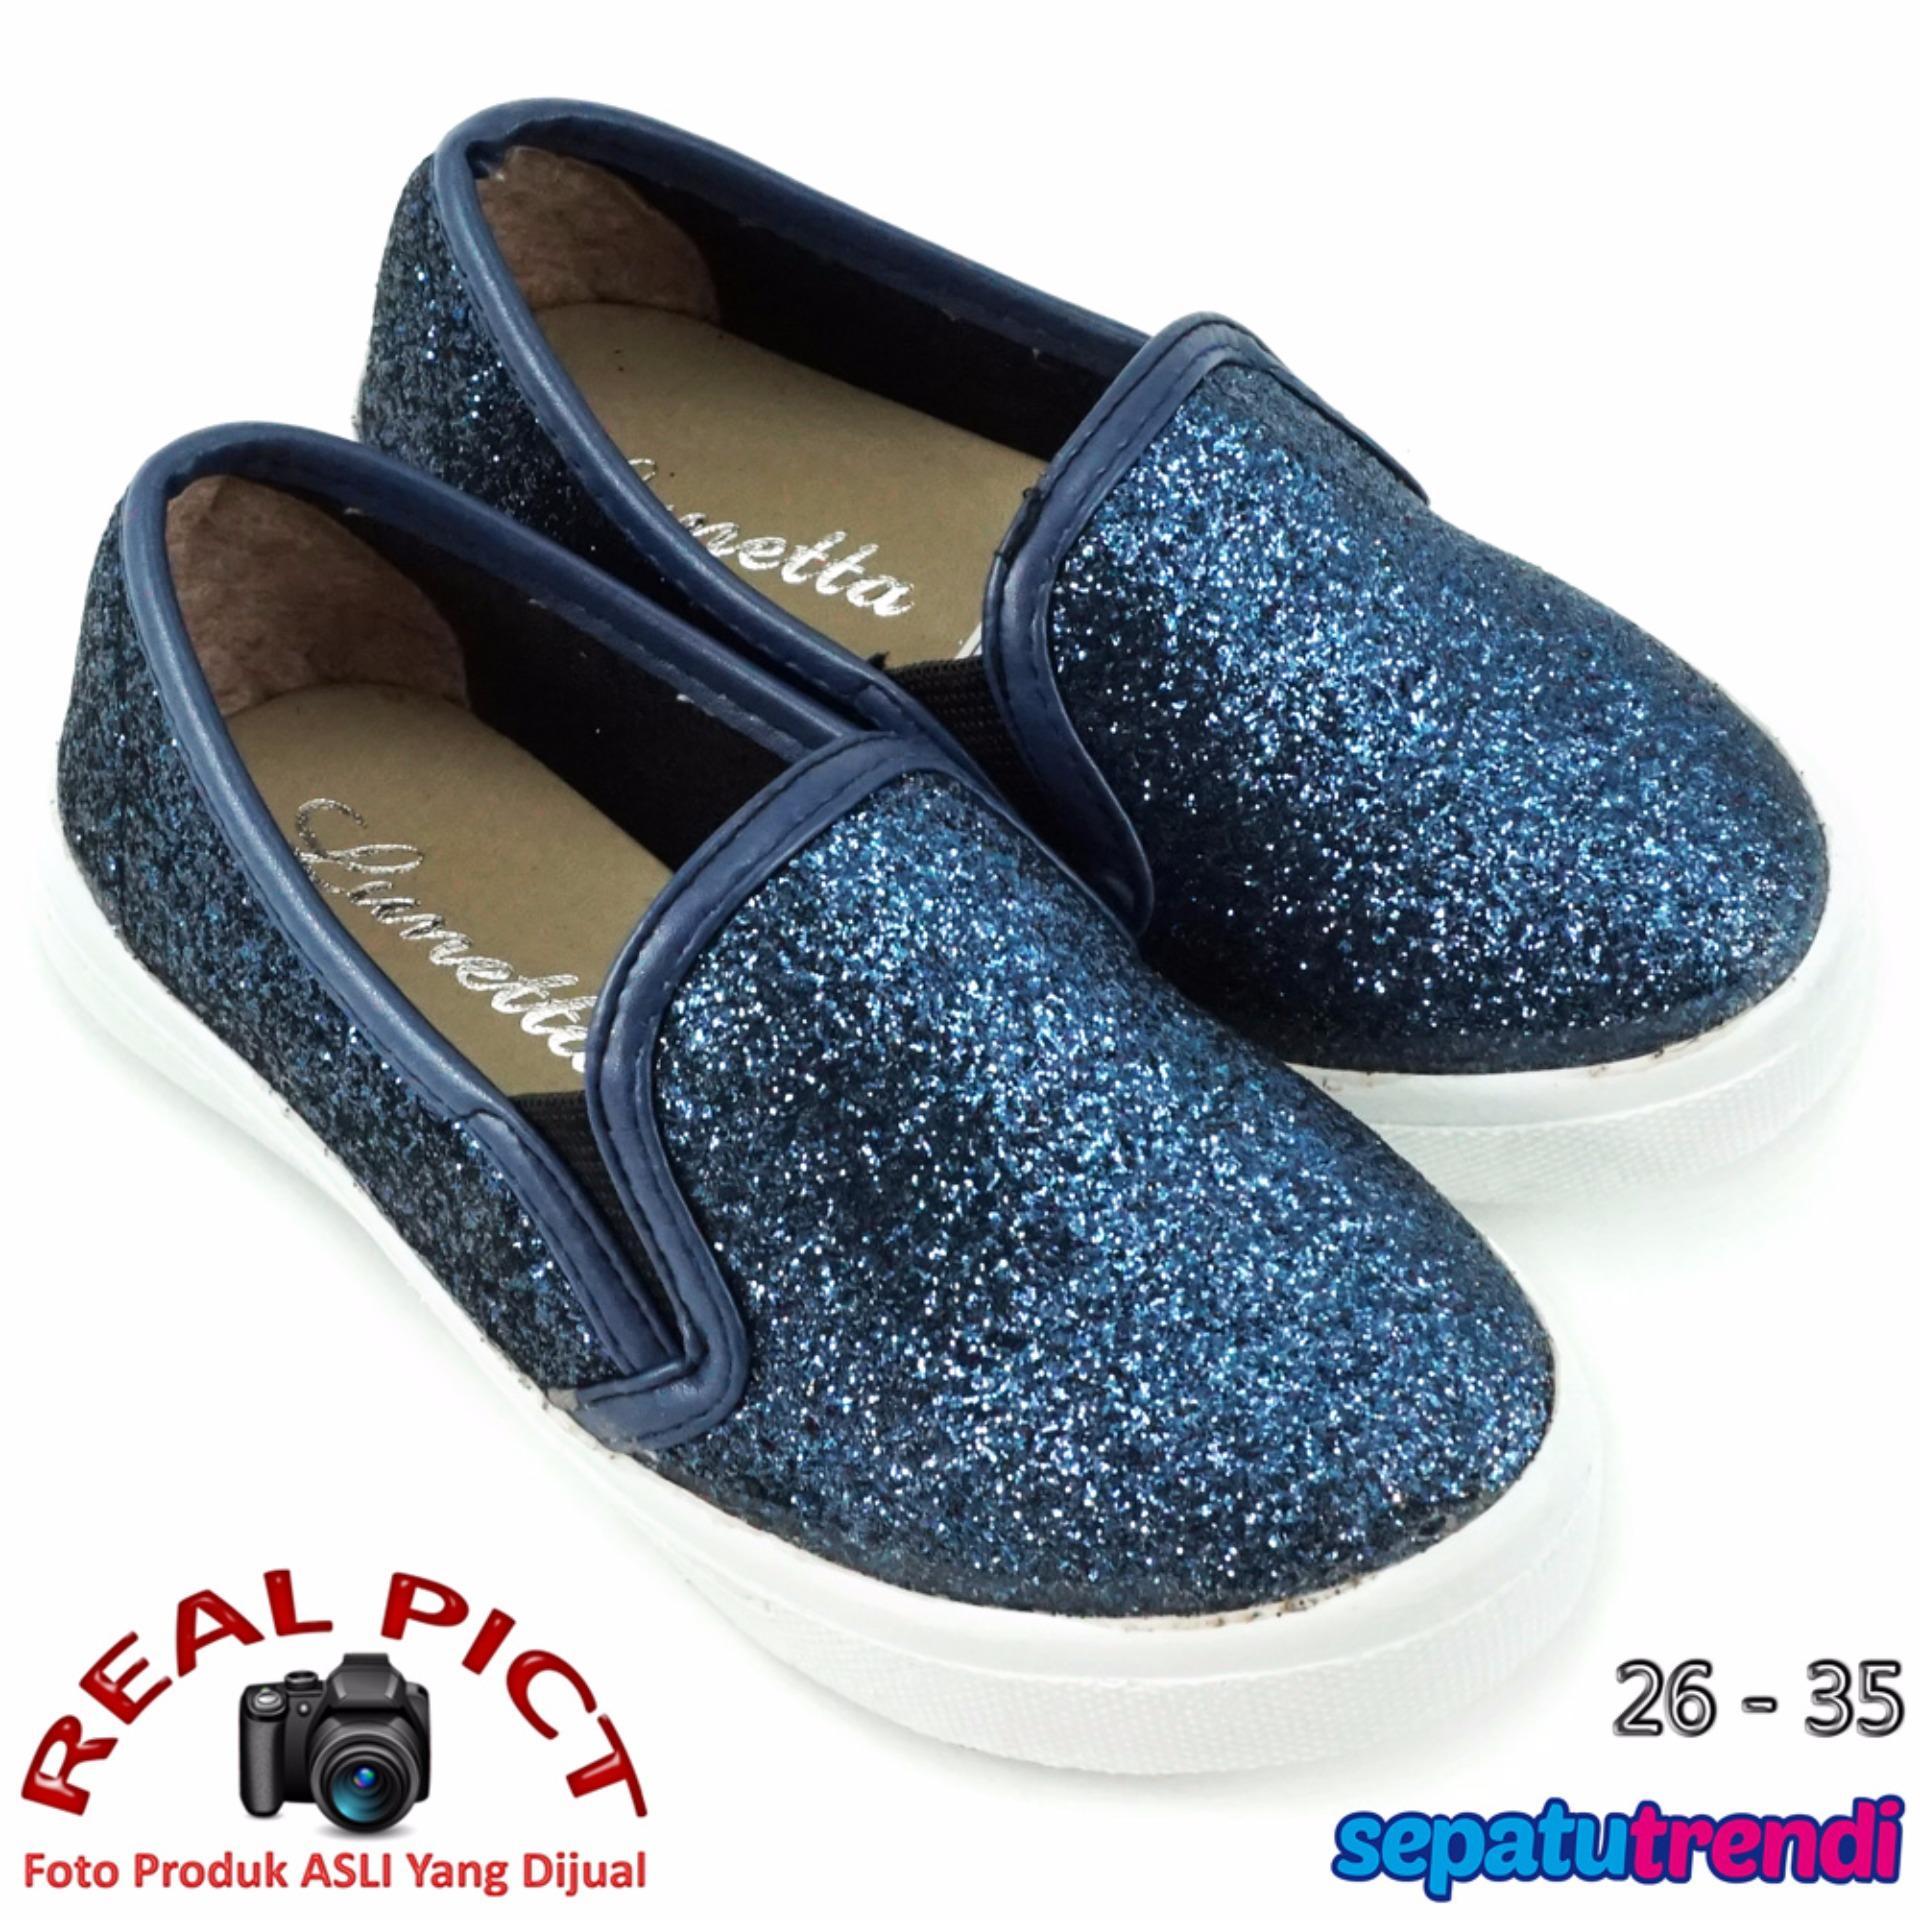 Lunetta Sepatu Anak Perempuan Slip On Diamond Dust FPS - Navy .